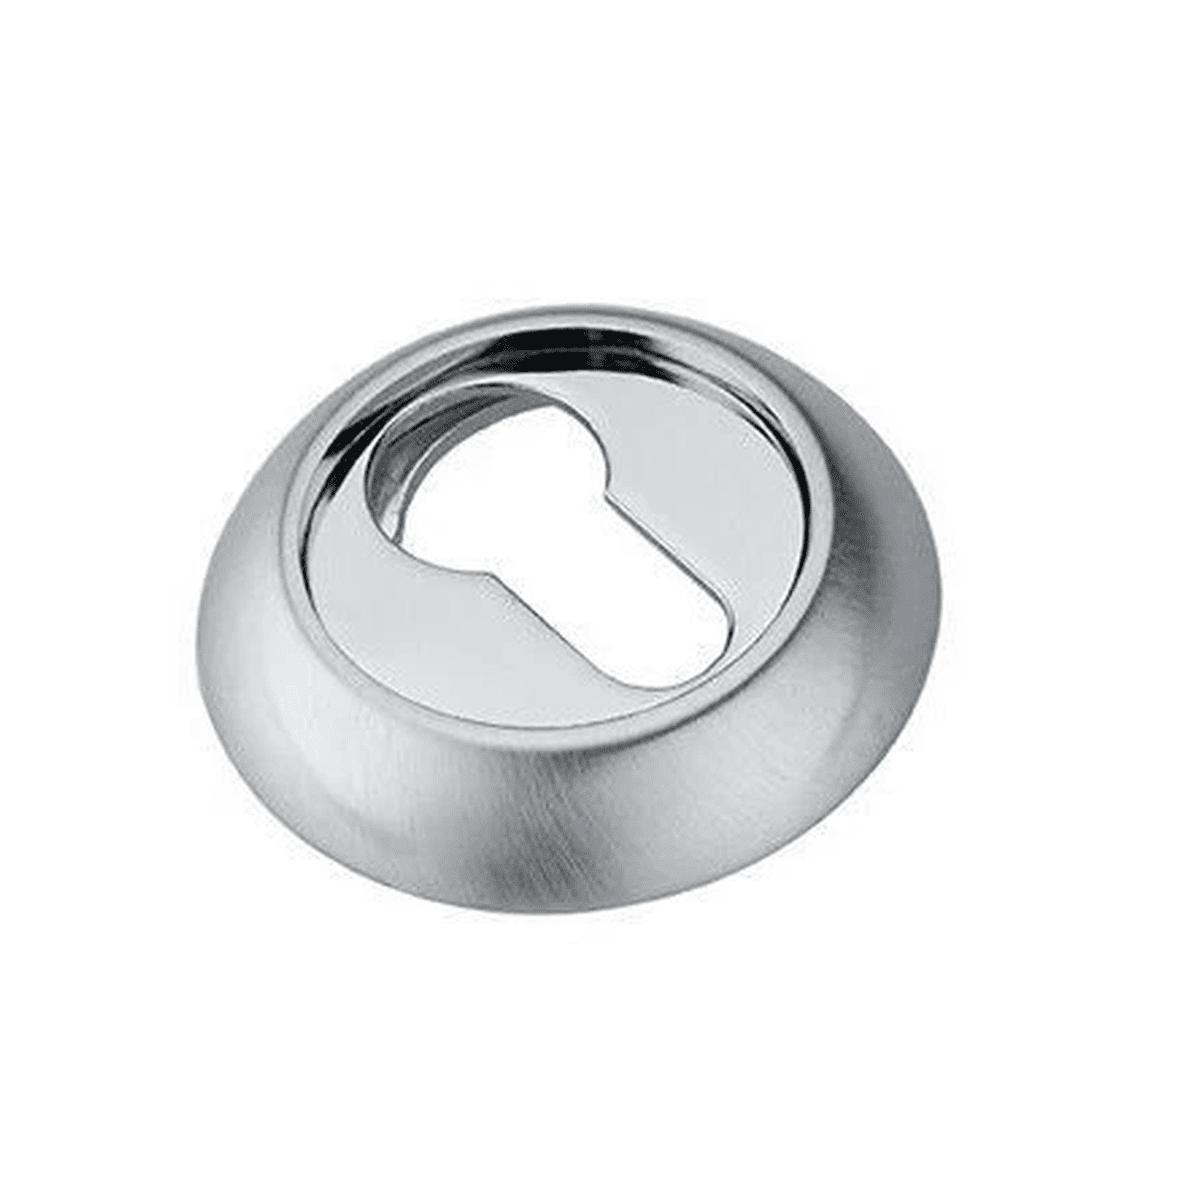 Накладка на цилиндр Adden Bau SC 001 chrome